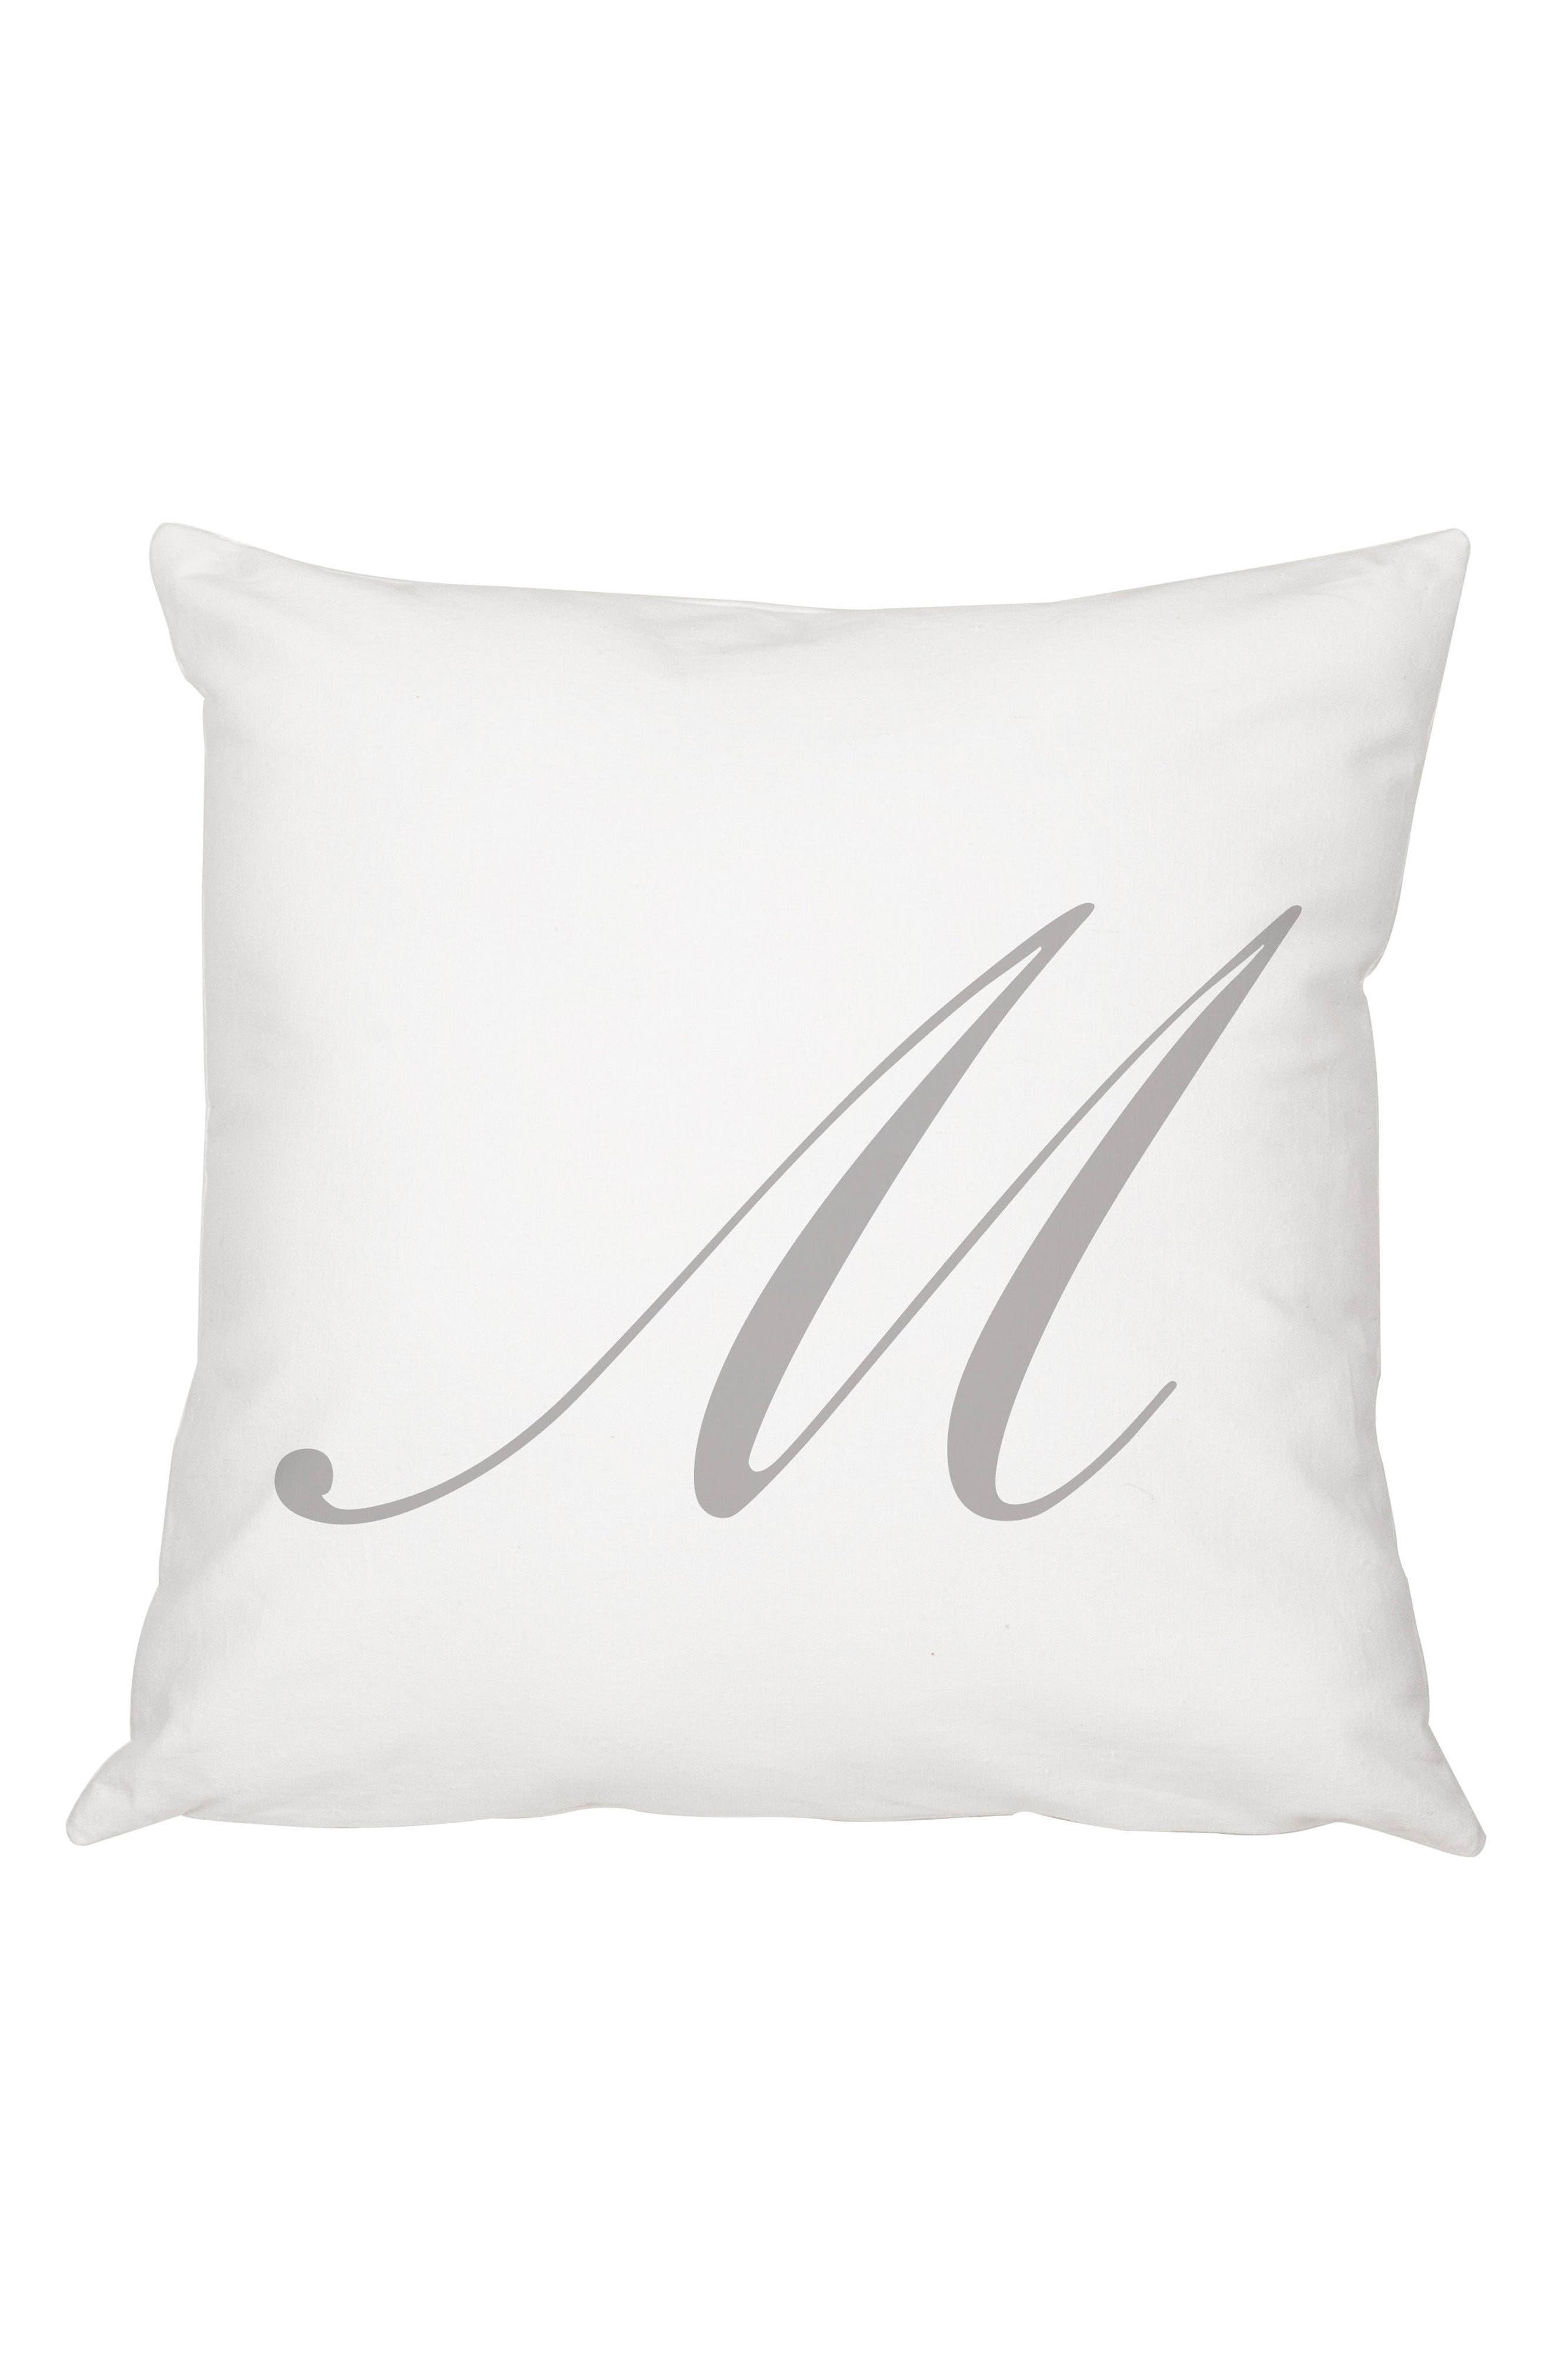 Main Image - Cathy's Concepts Script Monogram Accent Pillow